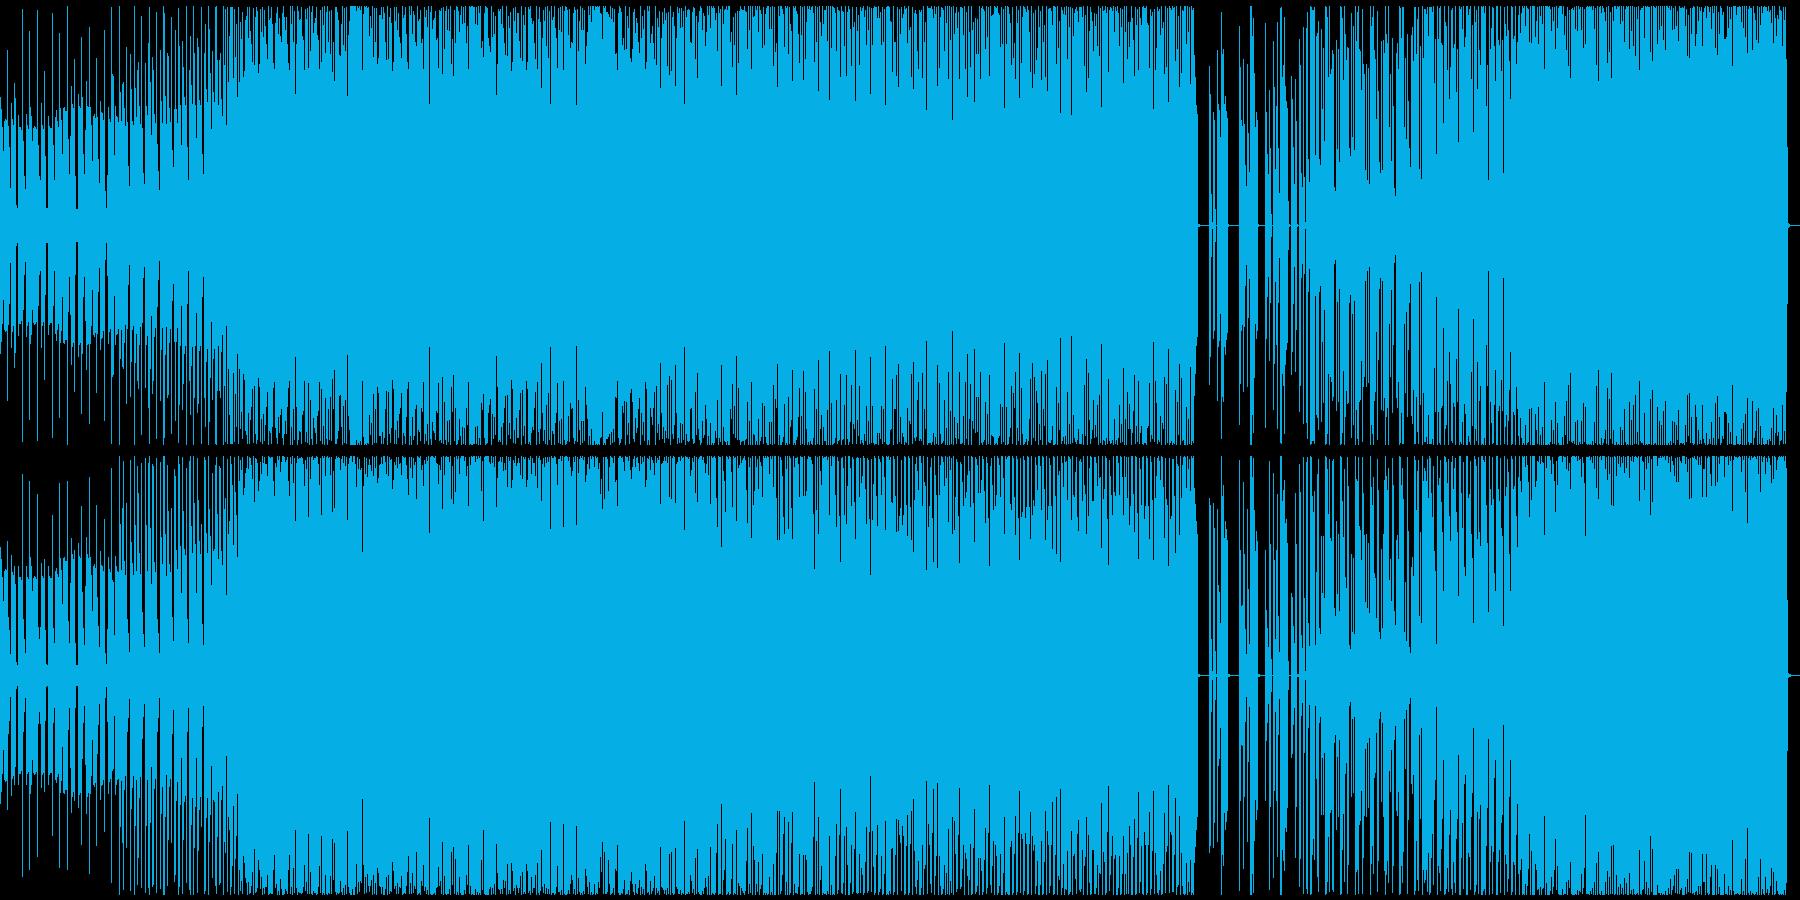 3xoscというシンセを用いたテクノの再生済みの波形